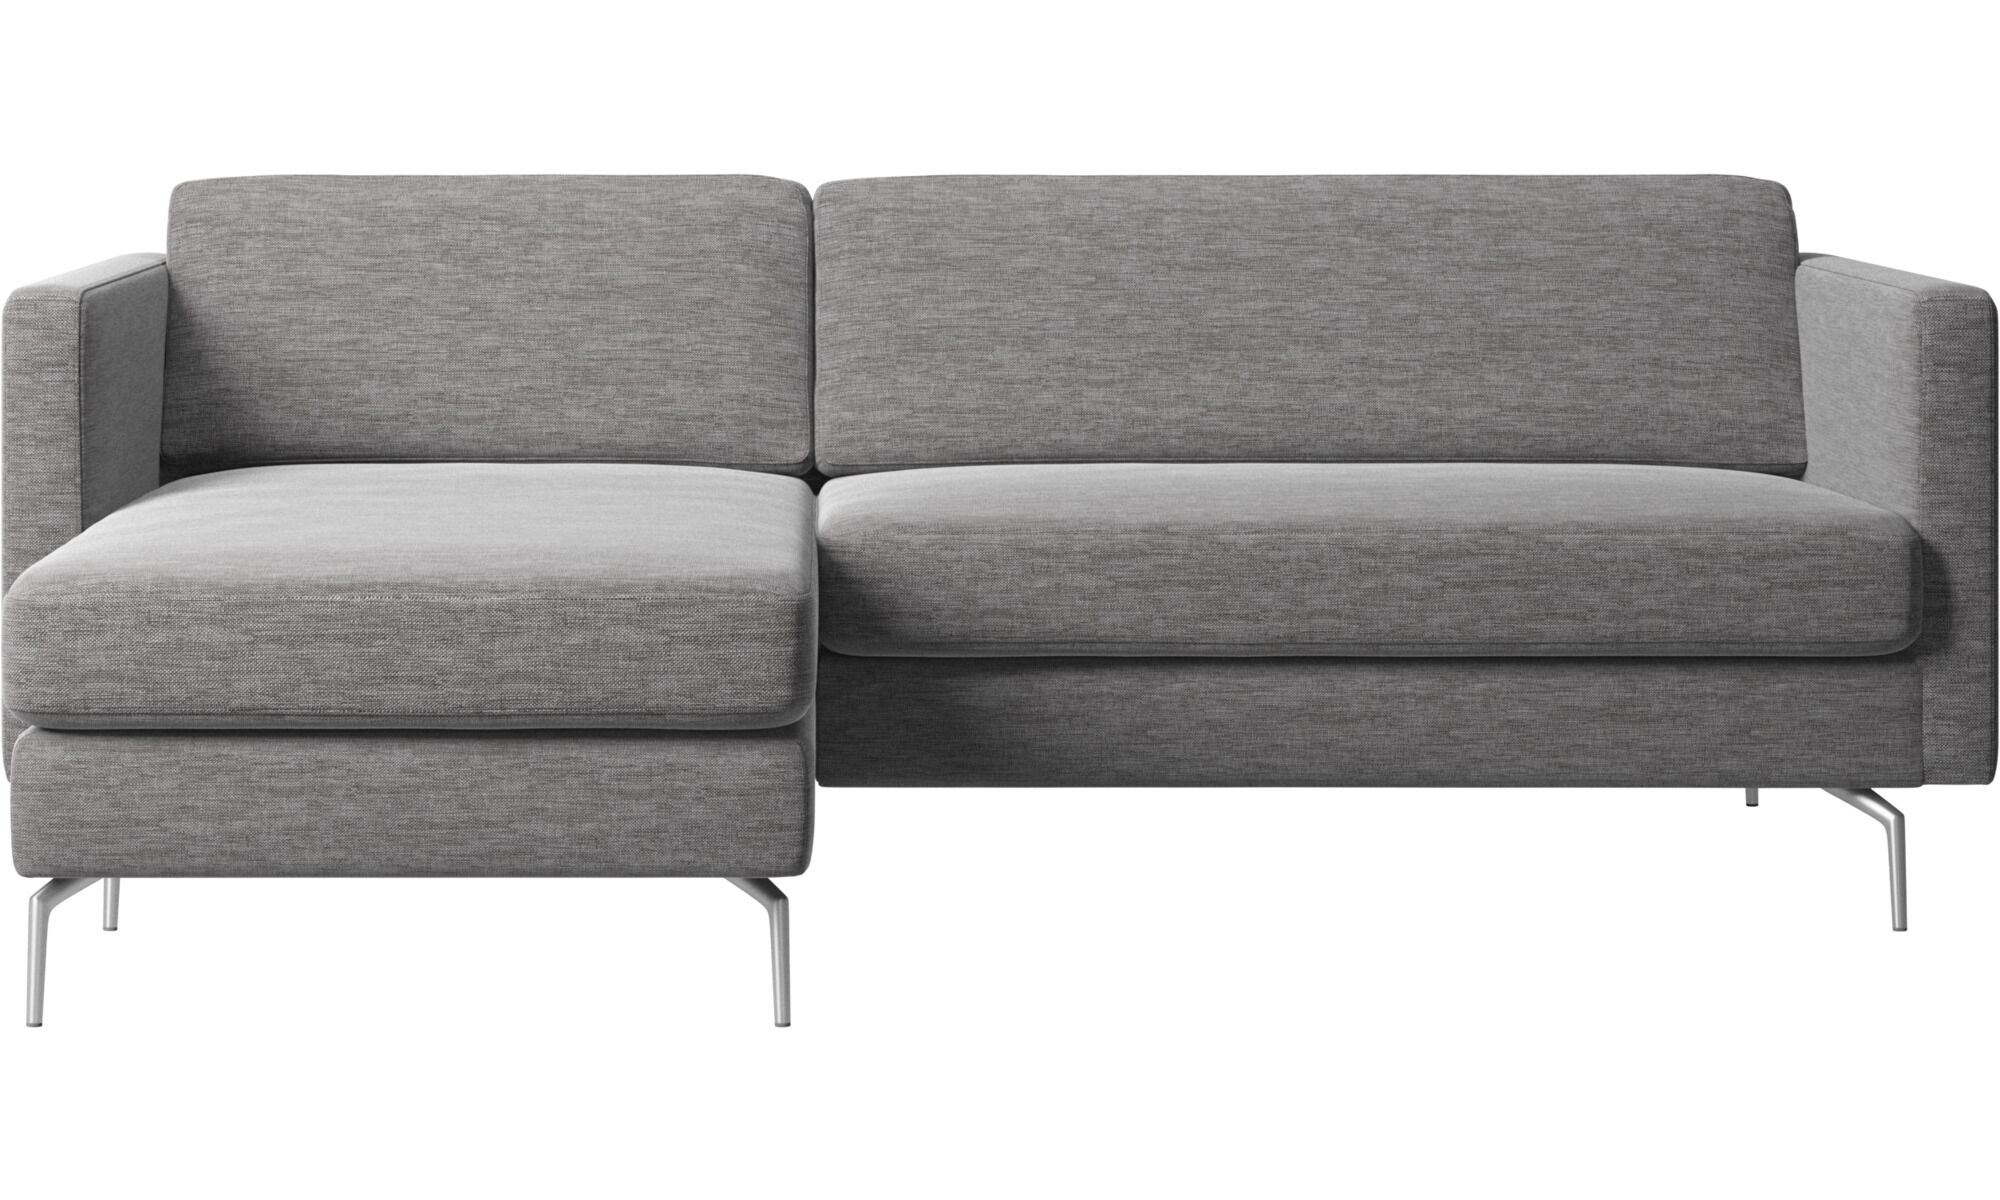 Chaise Lounge Sofas   Osaka Sofa With Resting Unit, Regular Seat   Gray    Fabric